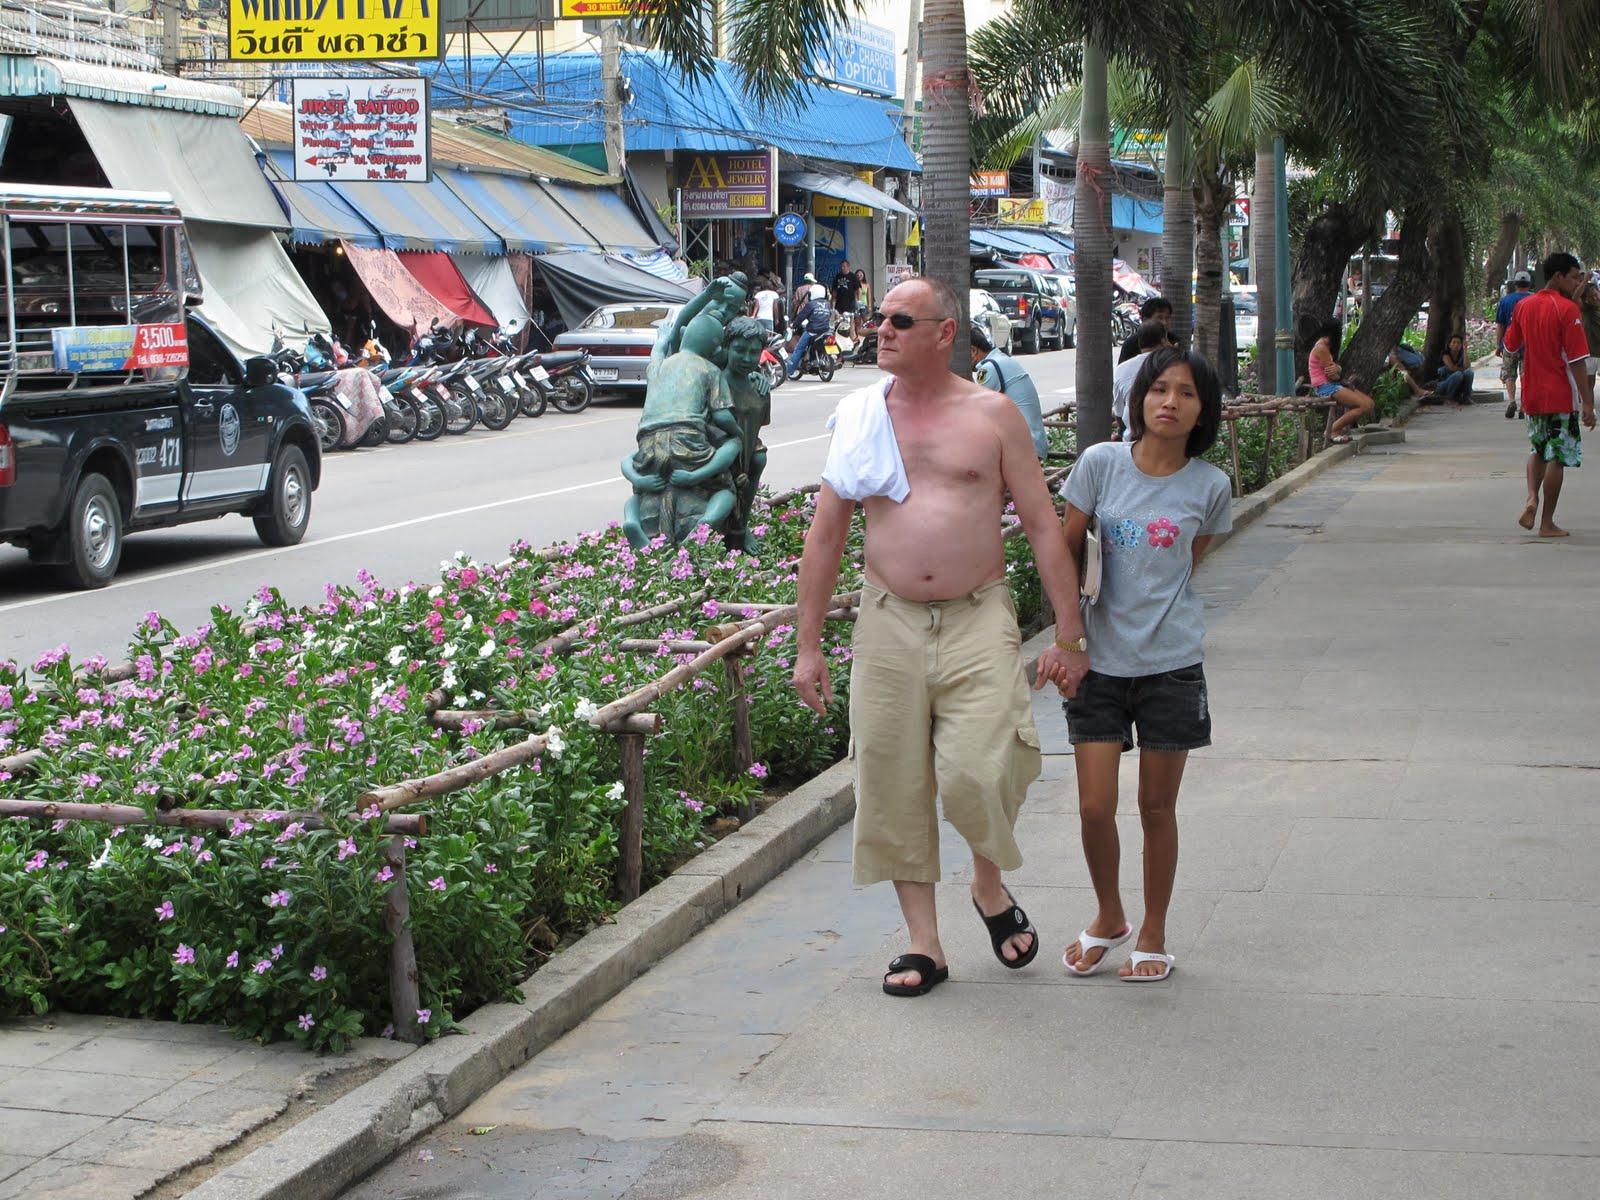 old man nude street